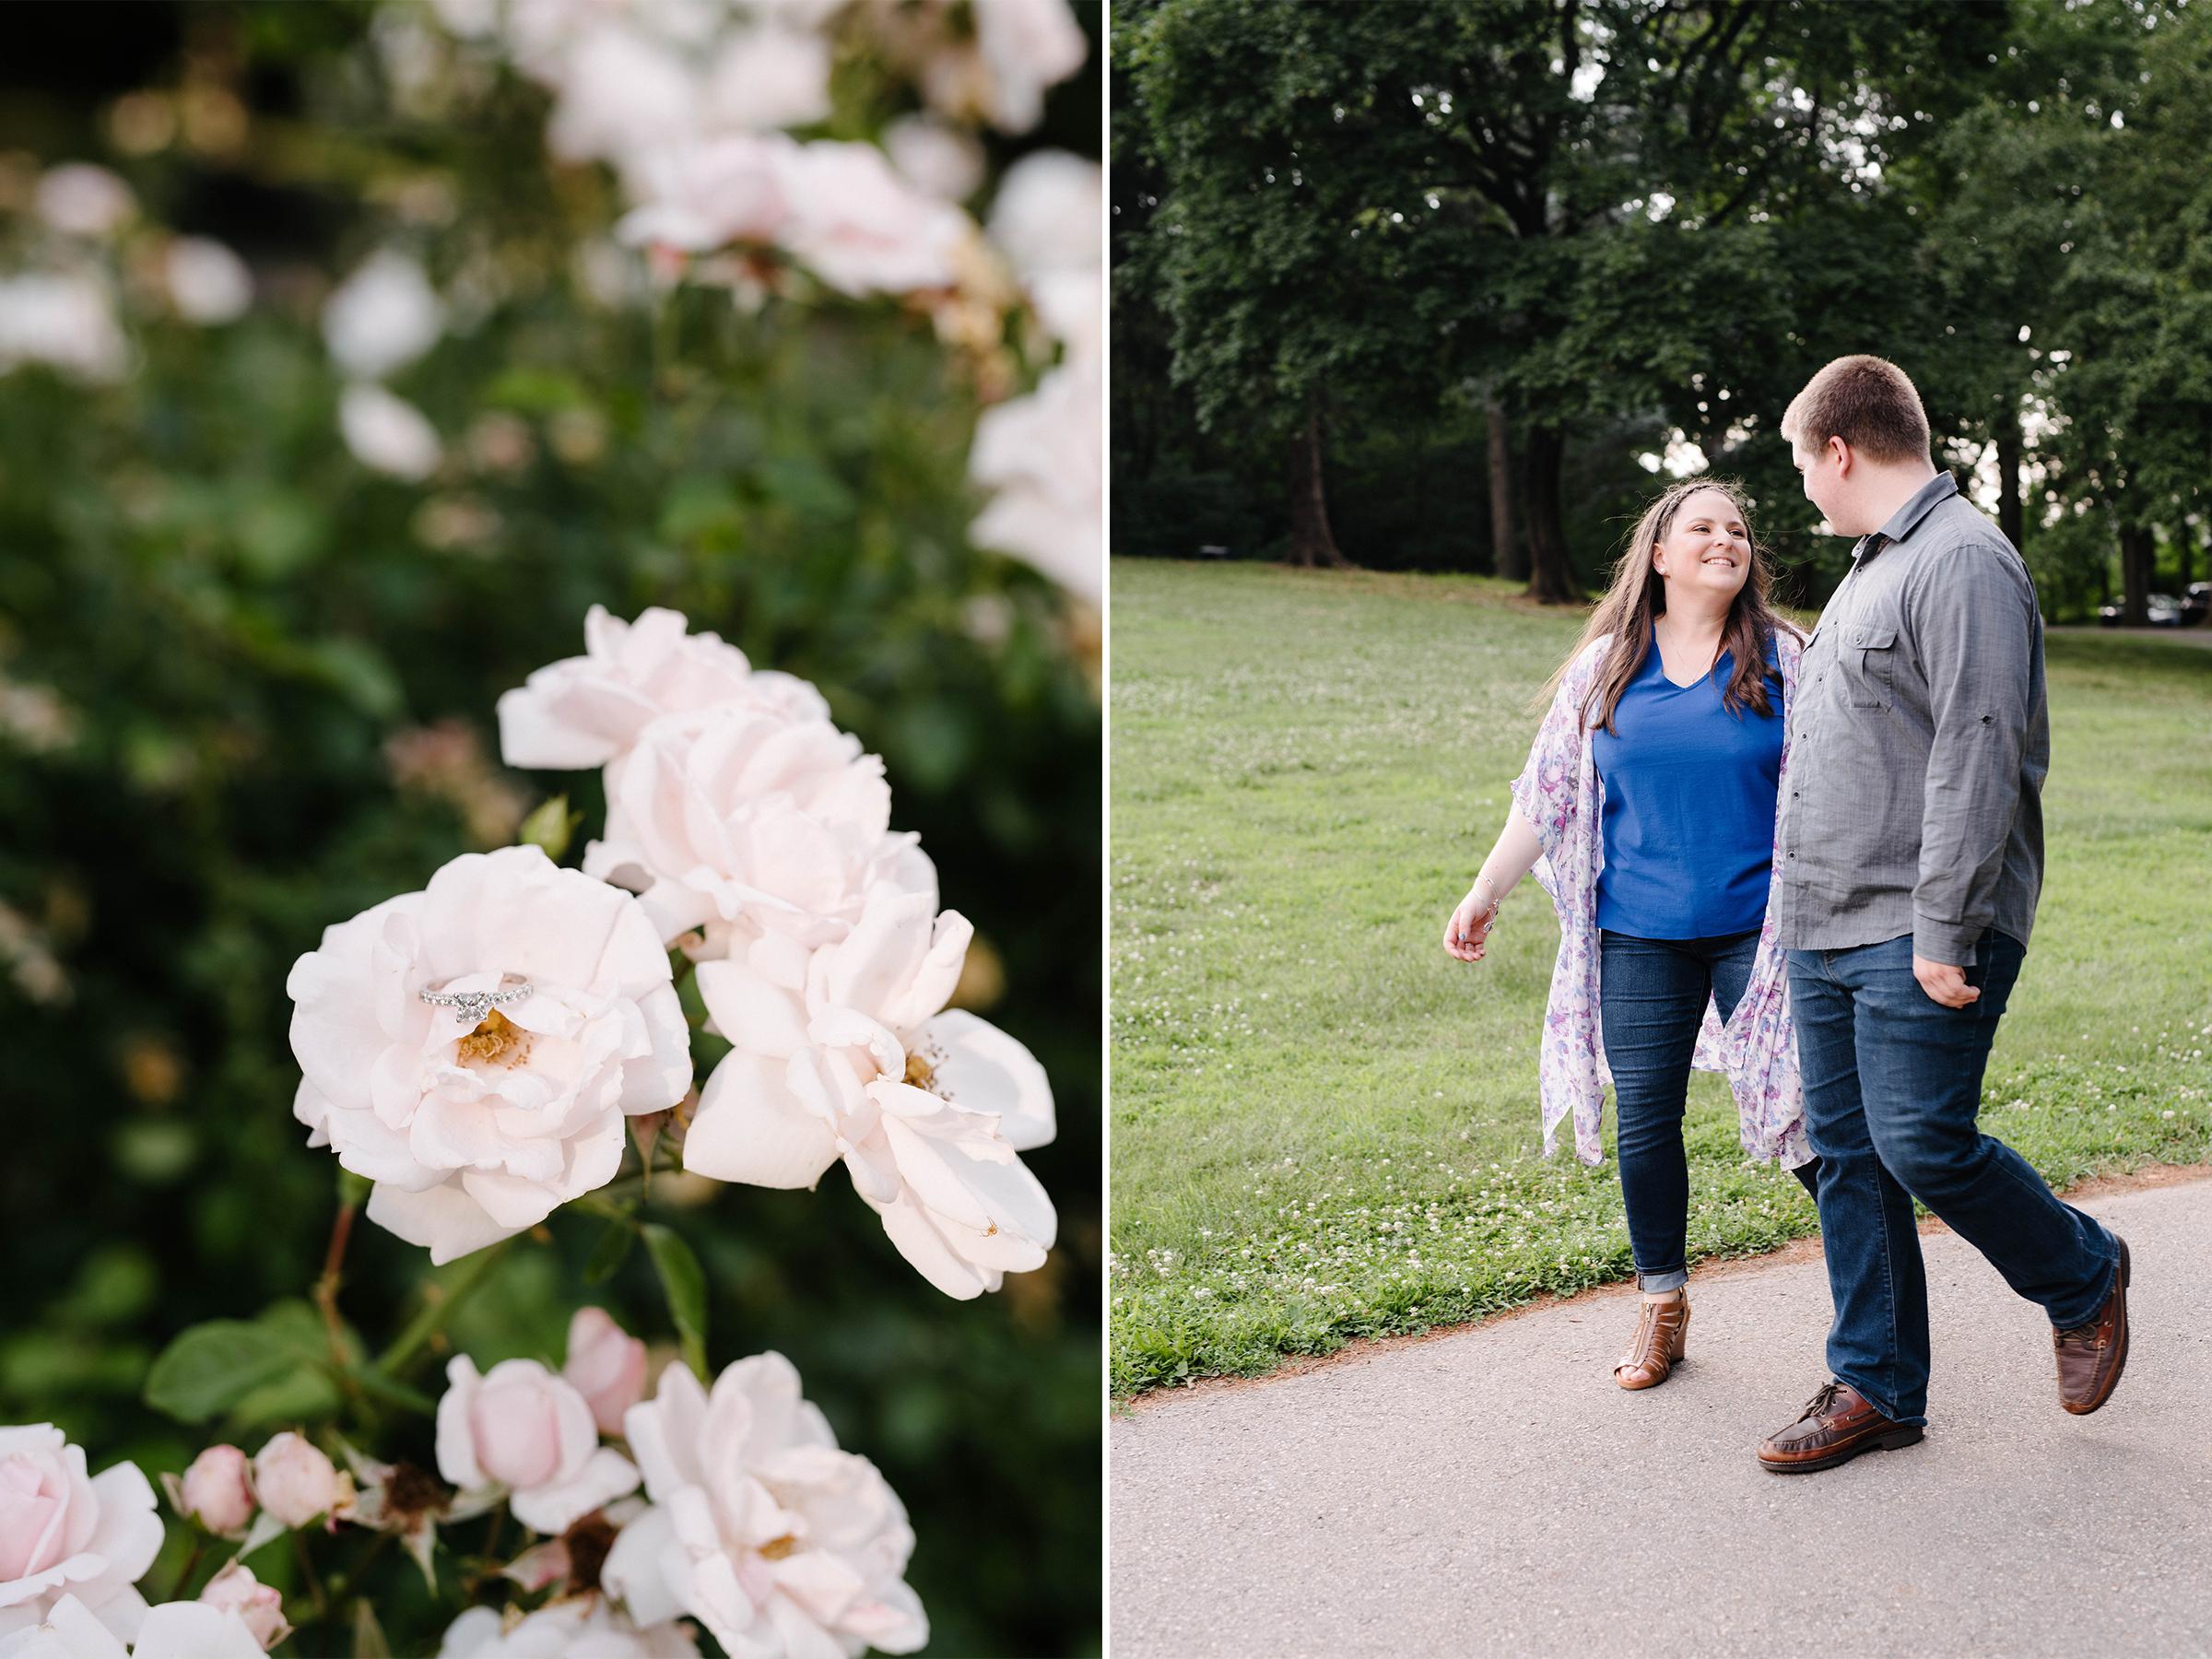 Brookdale Rose Garden- Engagement Photos- Engagement Ring- Bloomfield New Jersey- Olivia Christina Photo.jpg